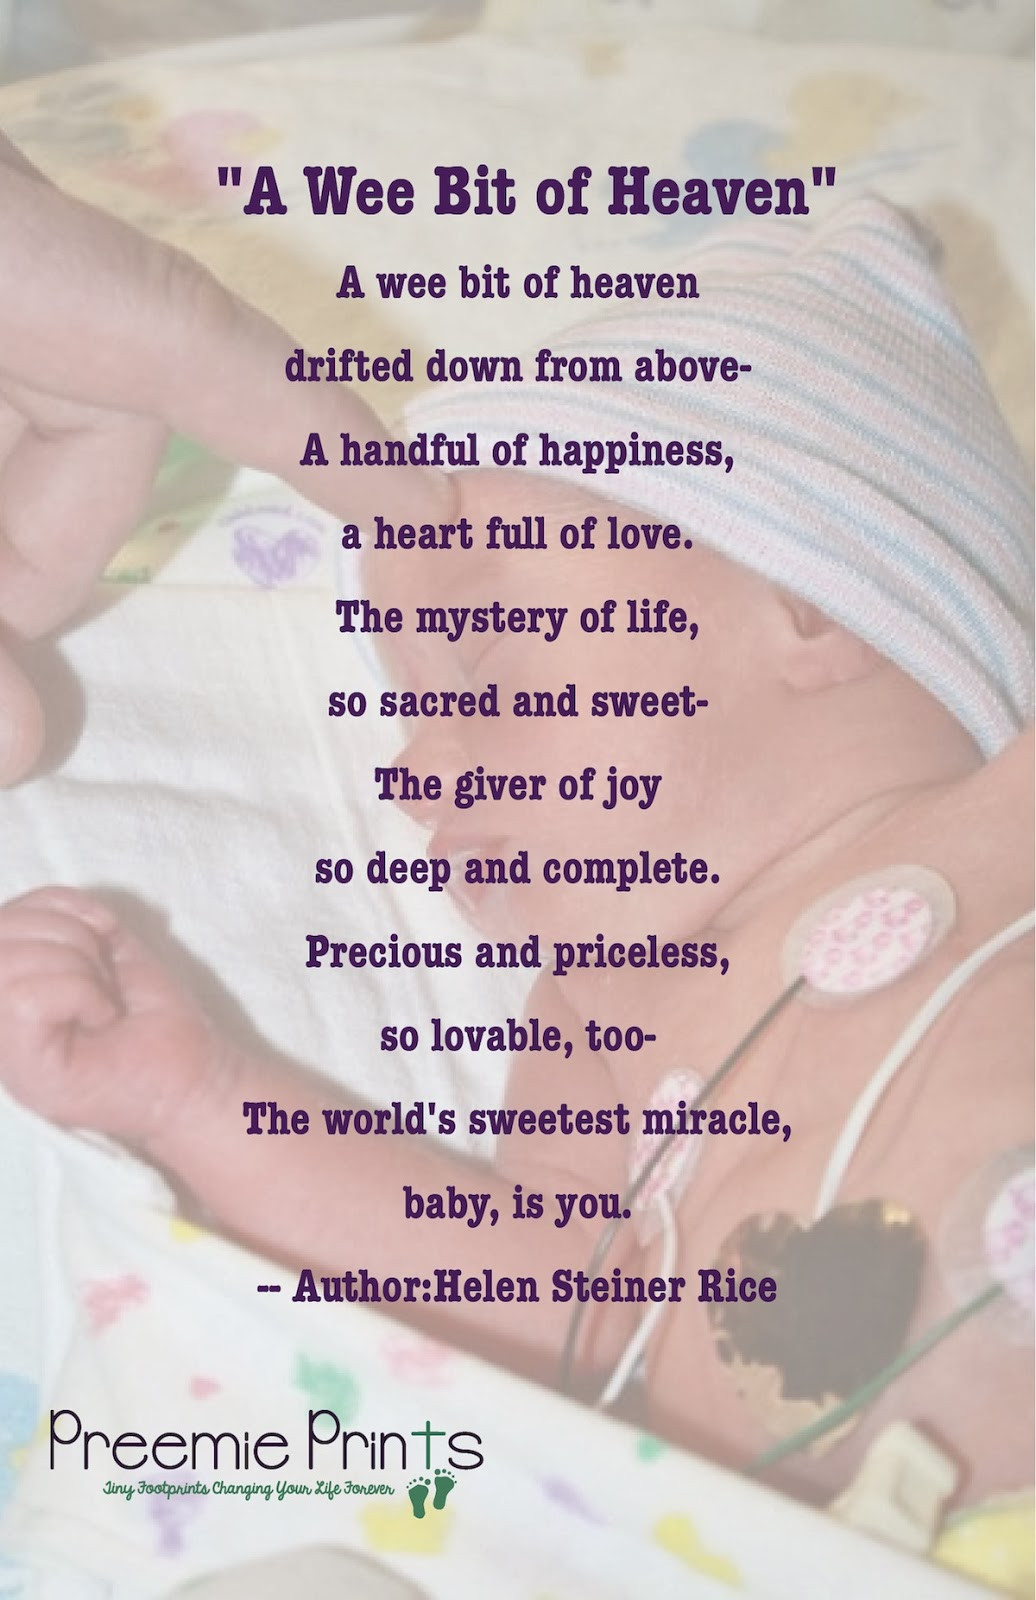 Baby Poetry Quotes  Preemie Prints Information Blog Poems Prayers & Quotes